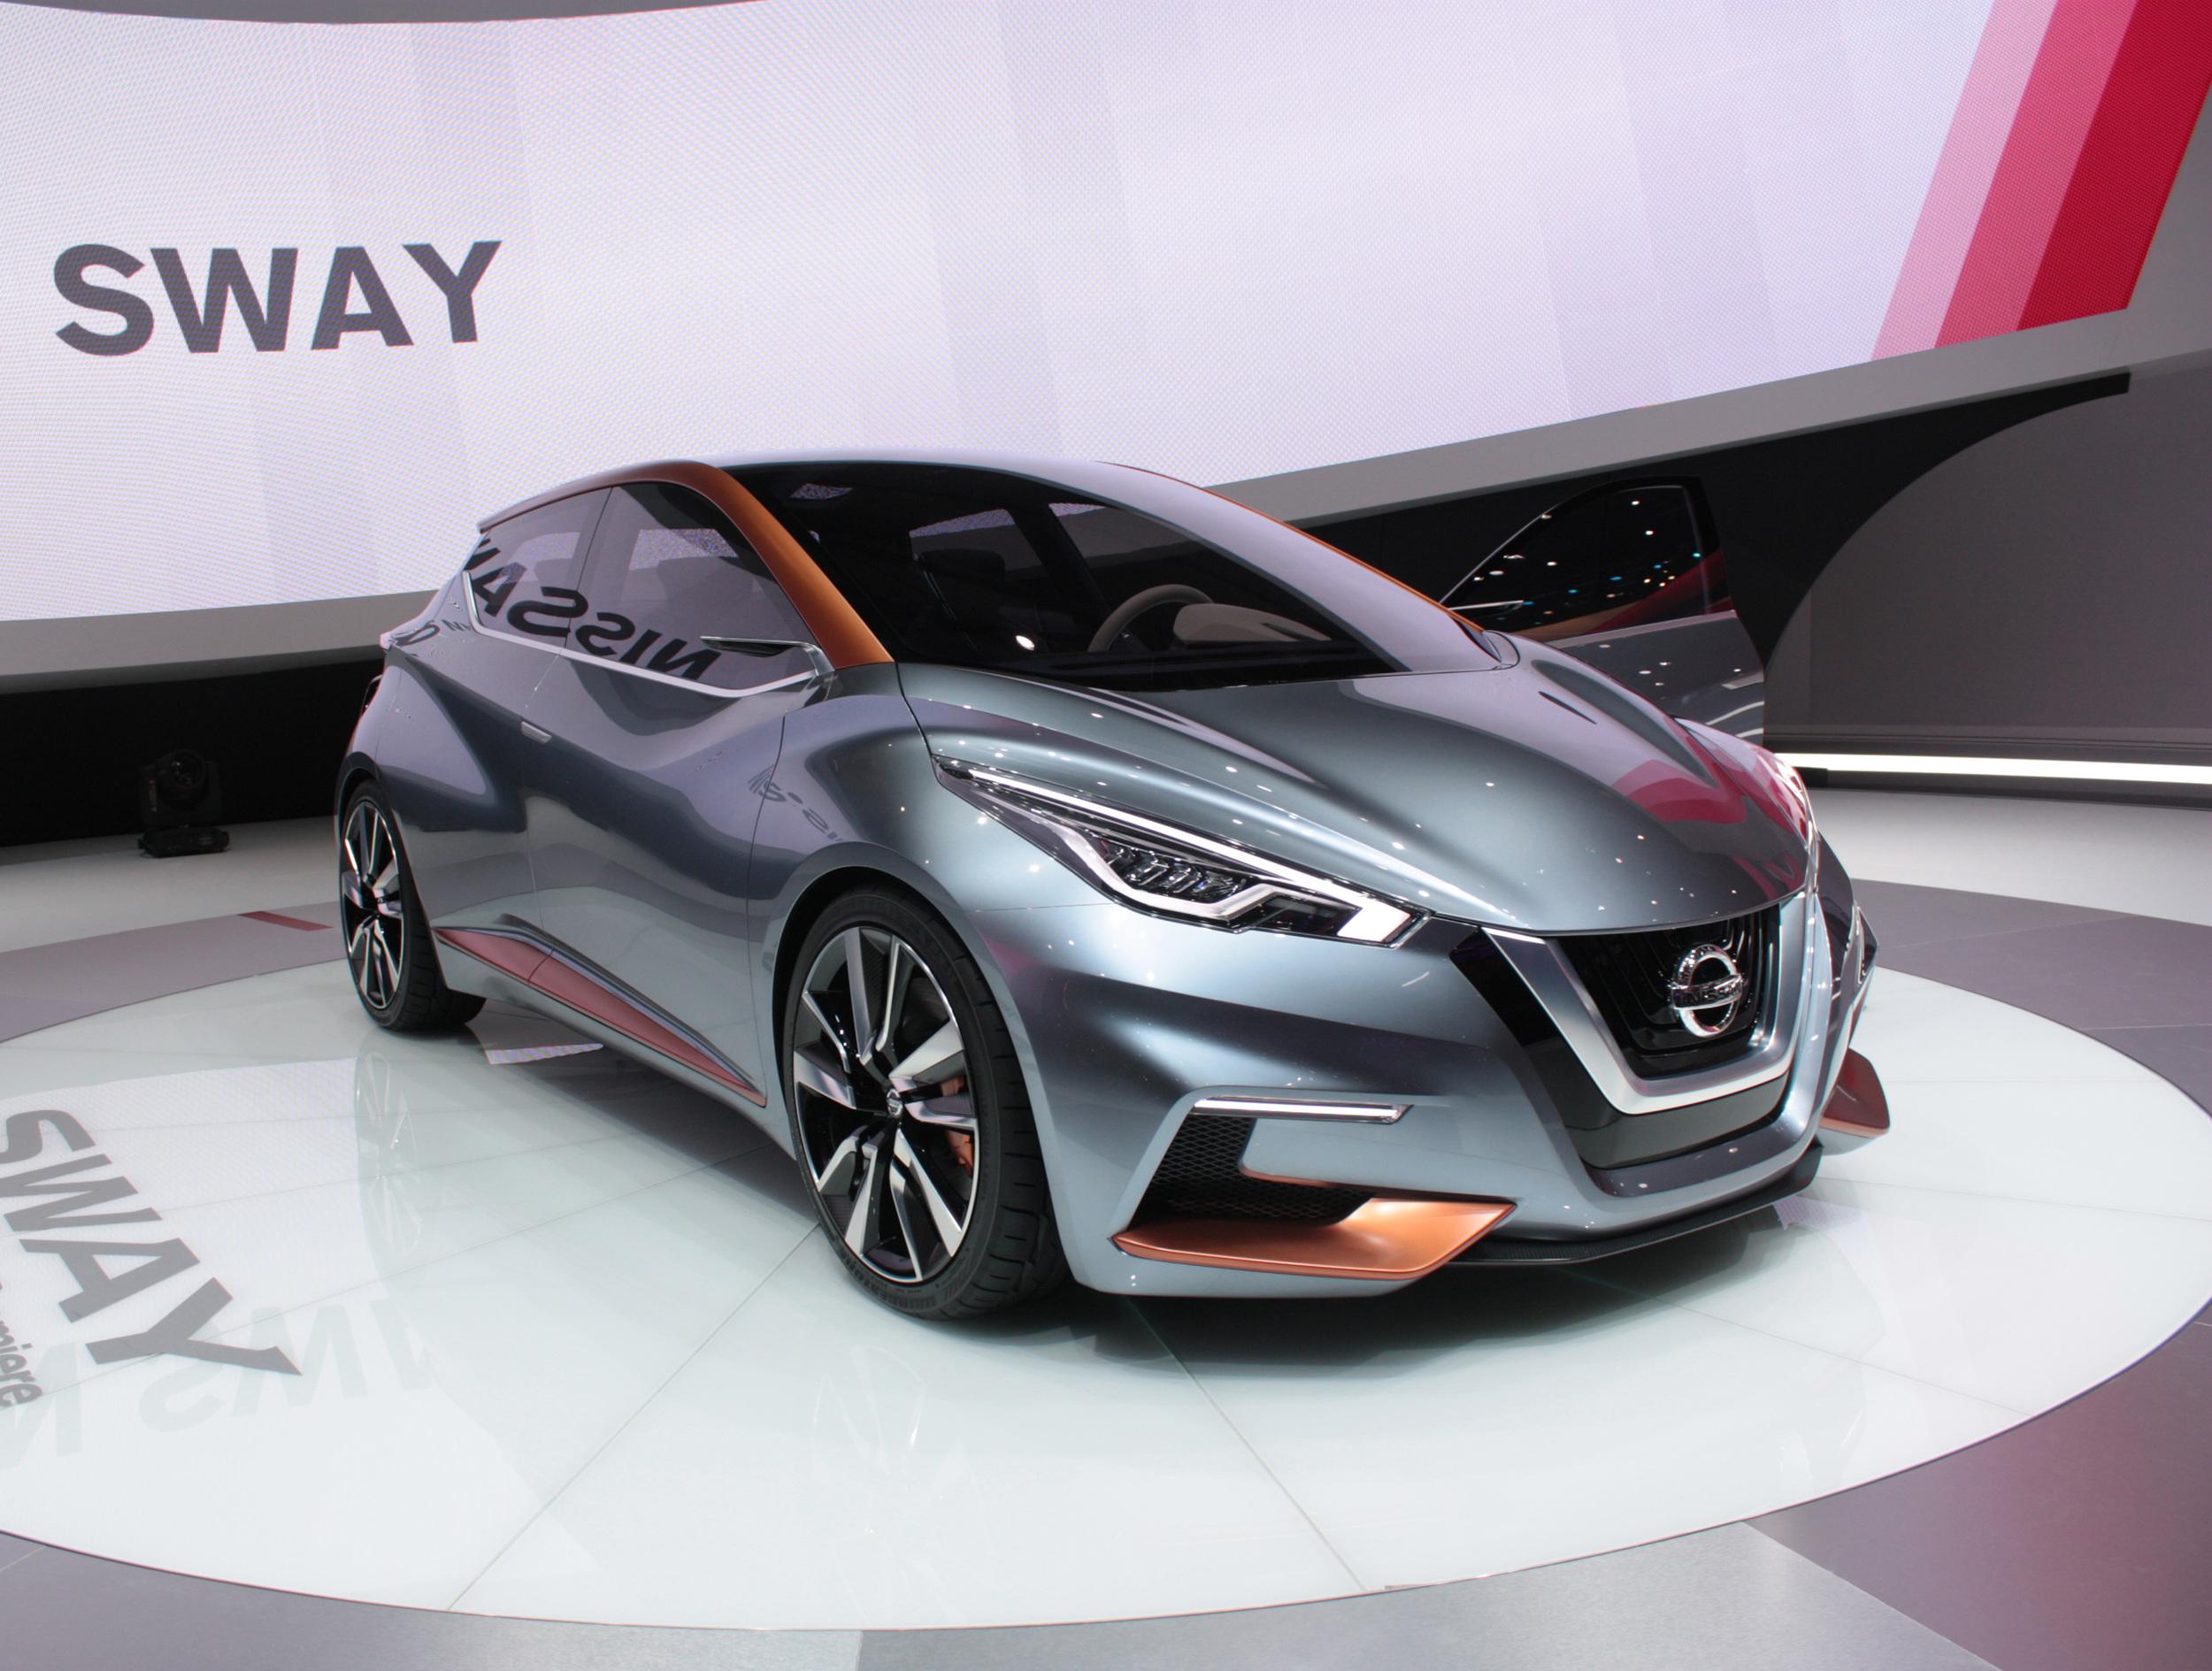 Geneva-Nissan-Sway-front.jpg